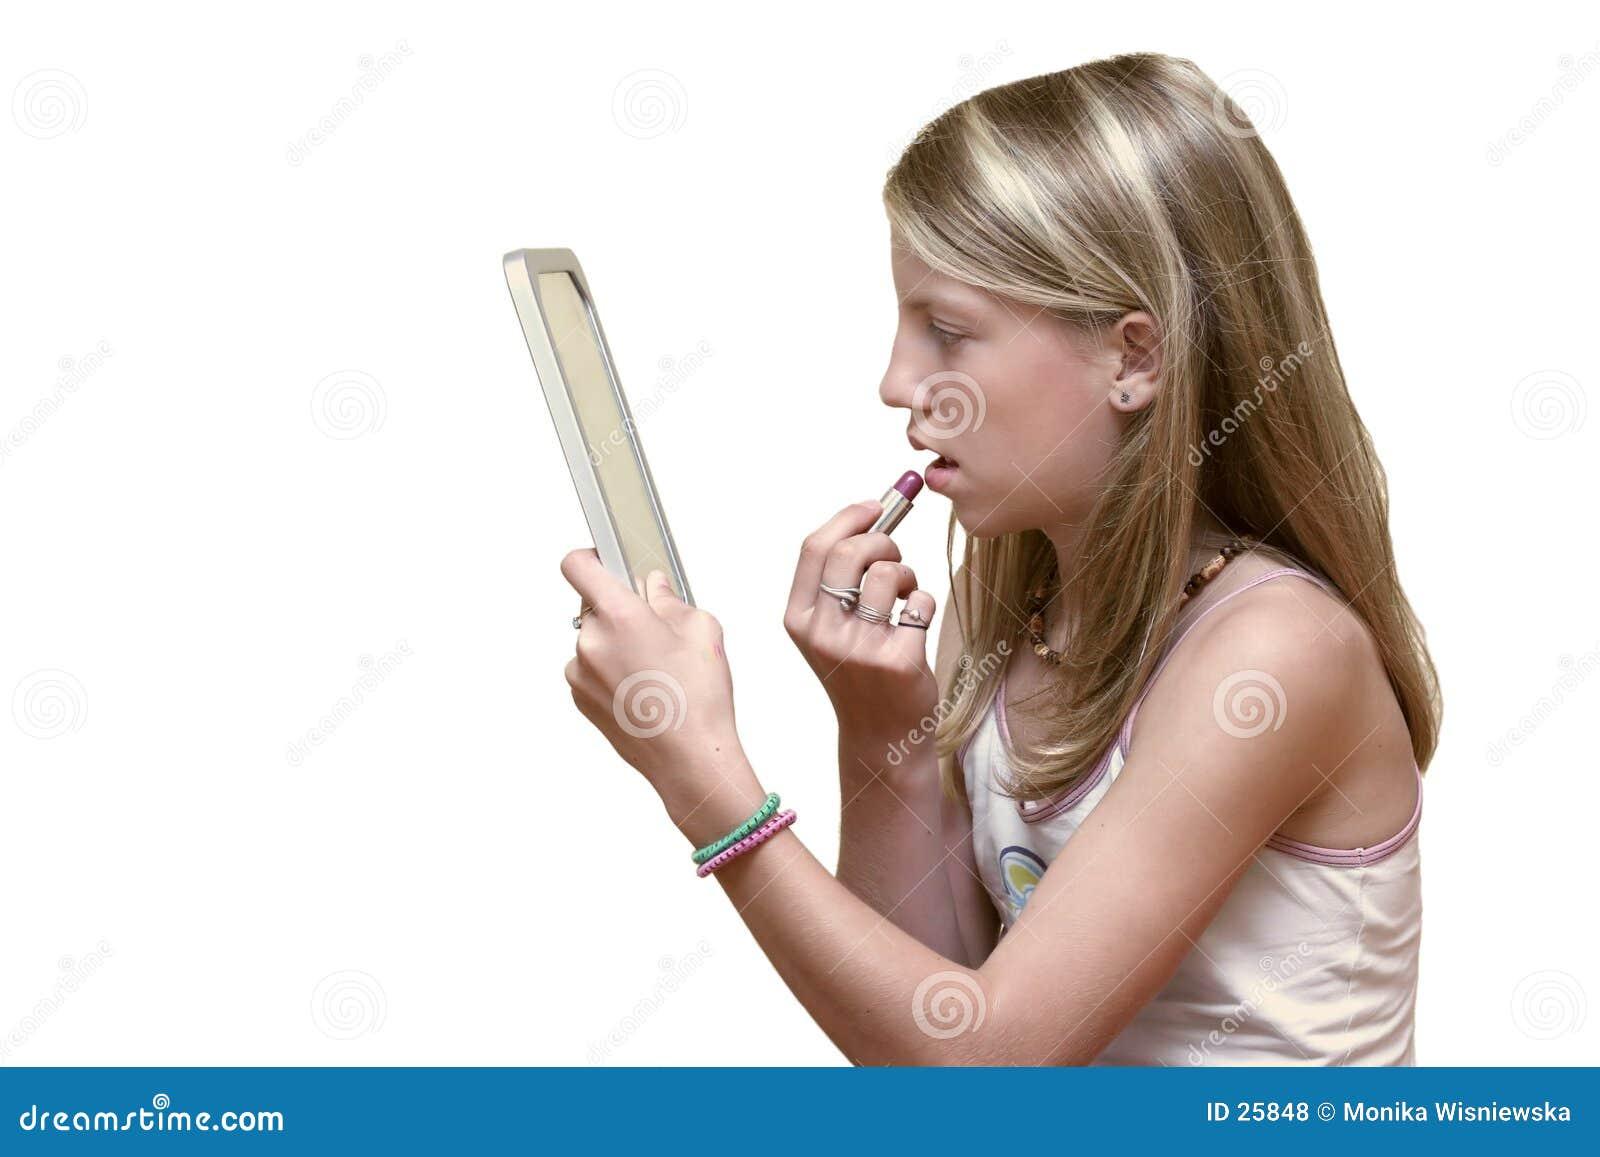 Makijaż nastolatków.